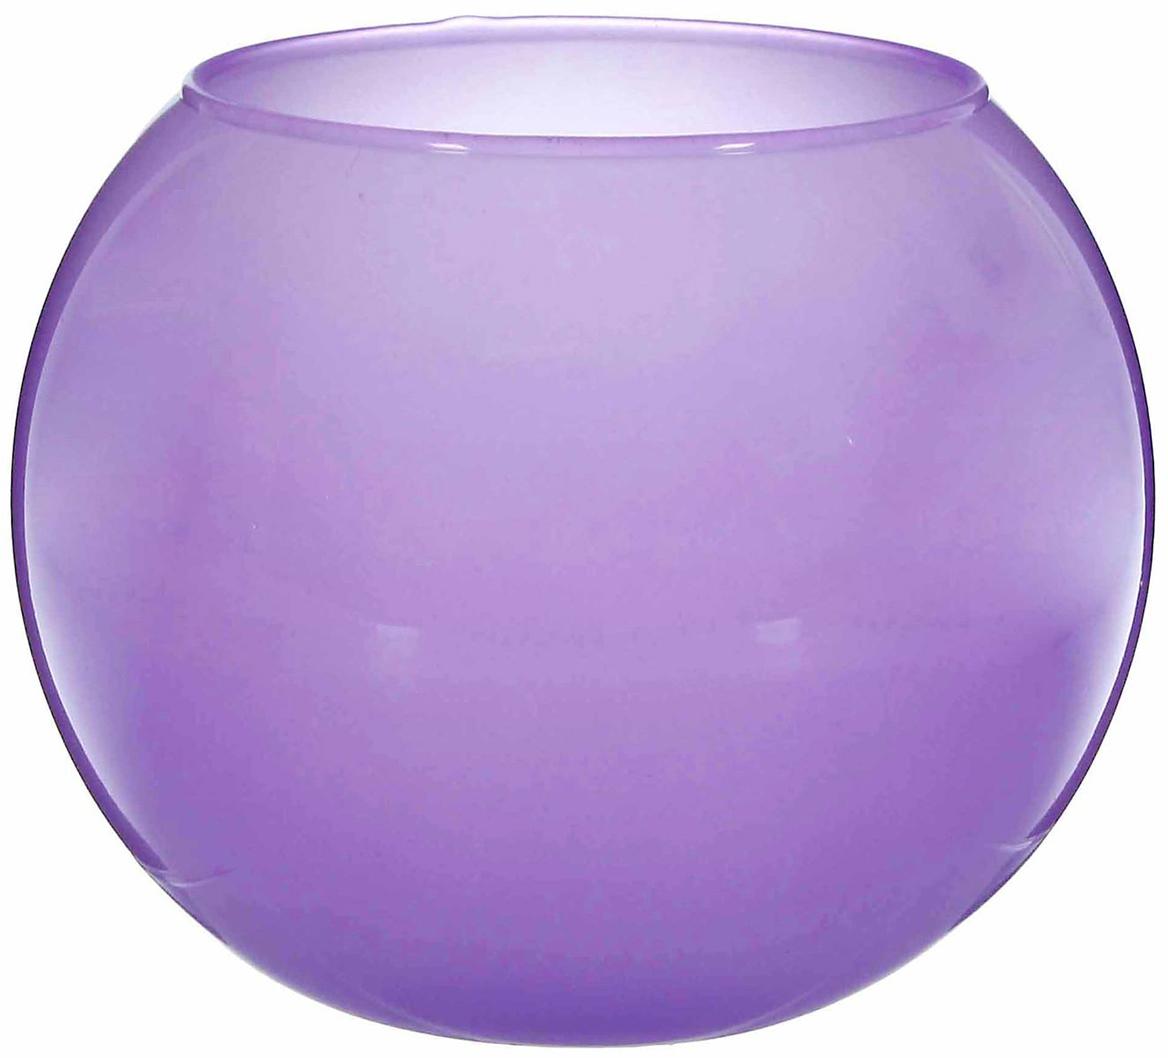 Ваза-шар Evis Сиреневый мираж, цвет: сиреневый, 3 л ваза шар evis сиреневый мираж цвет сиреневый 3 л